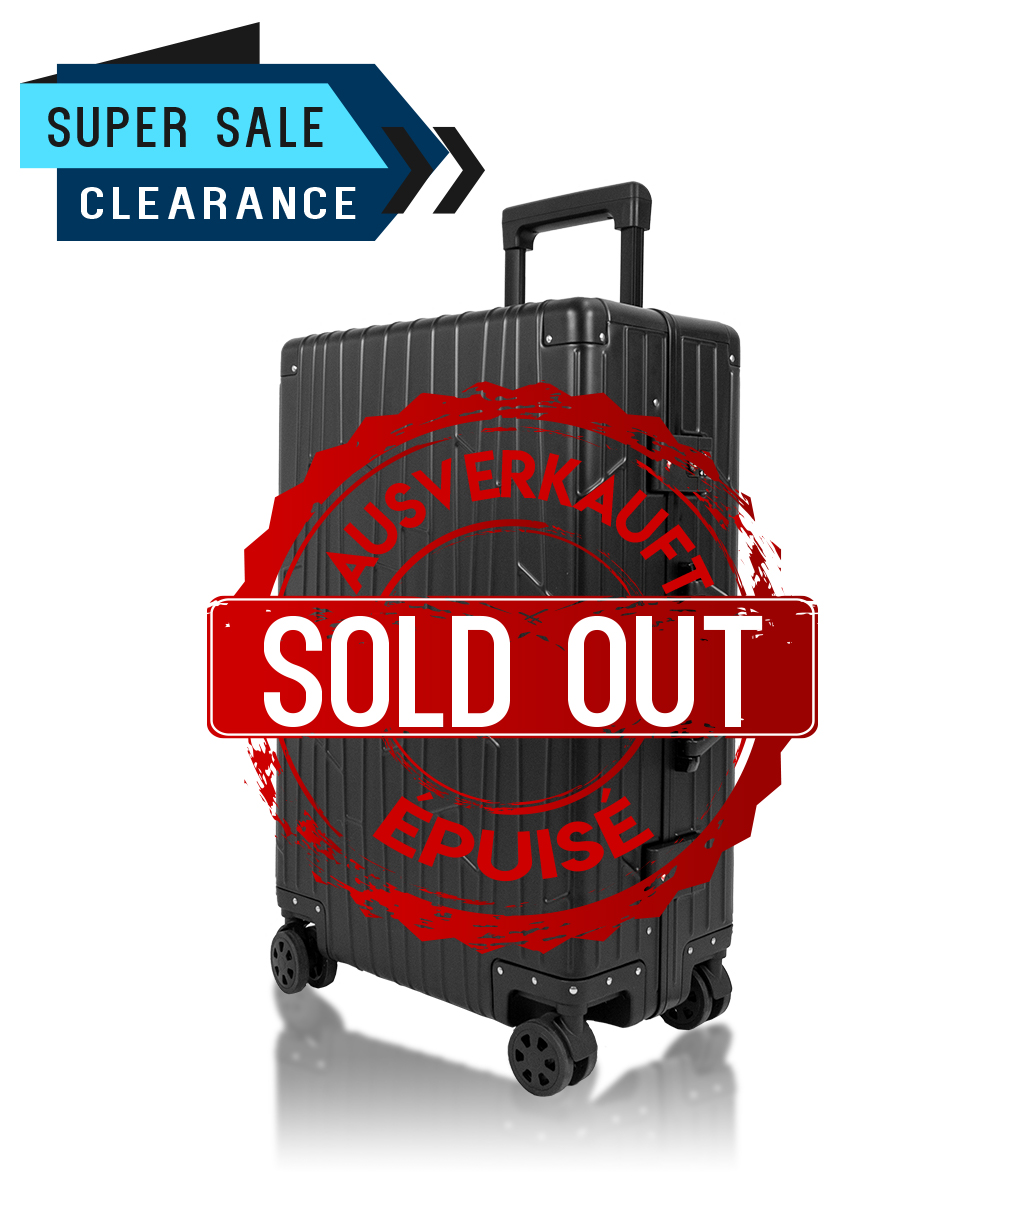 Check-in KOM-001W schwarz aluminium suitcase gundel checked luggage tsa-locks bware sale